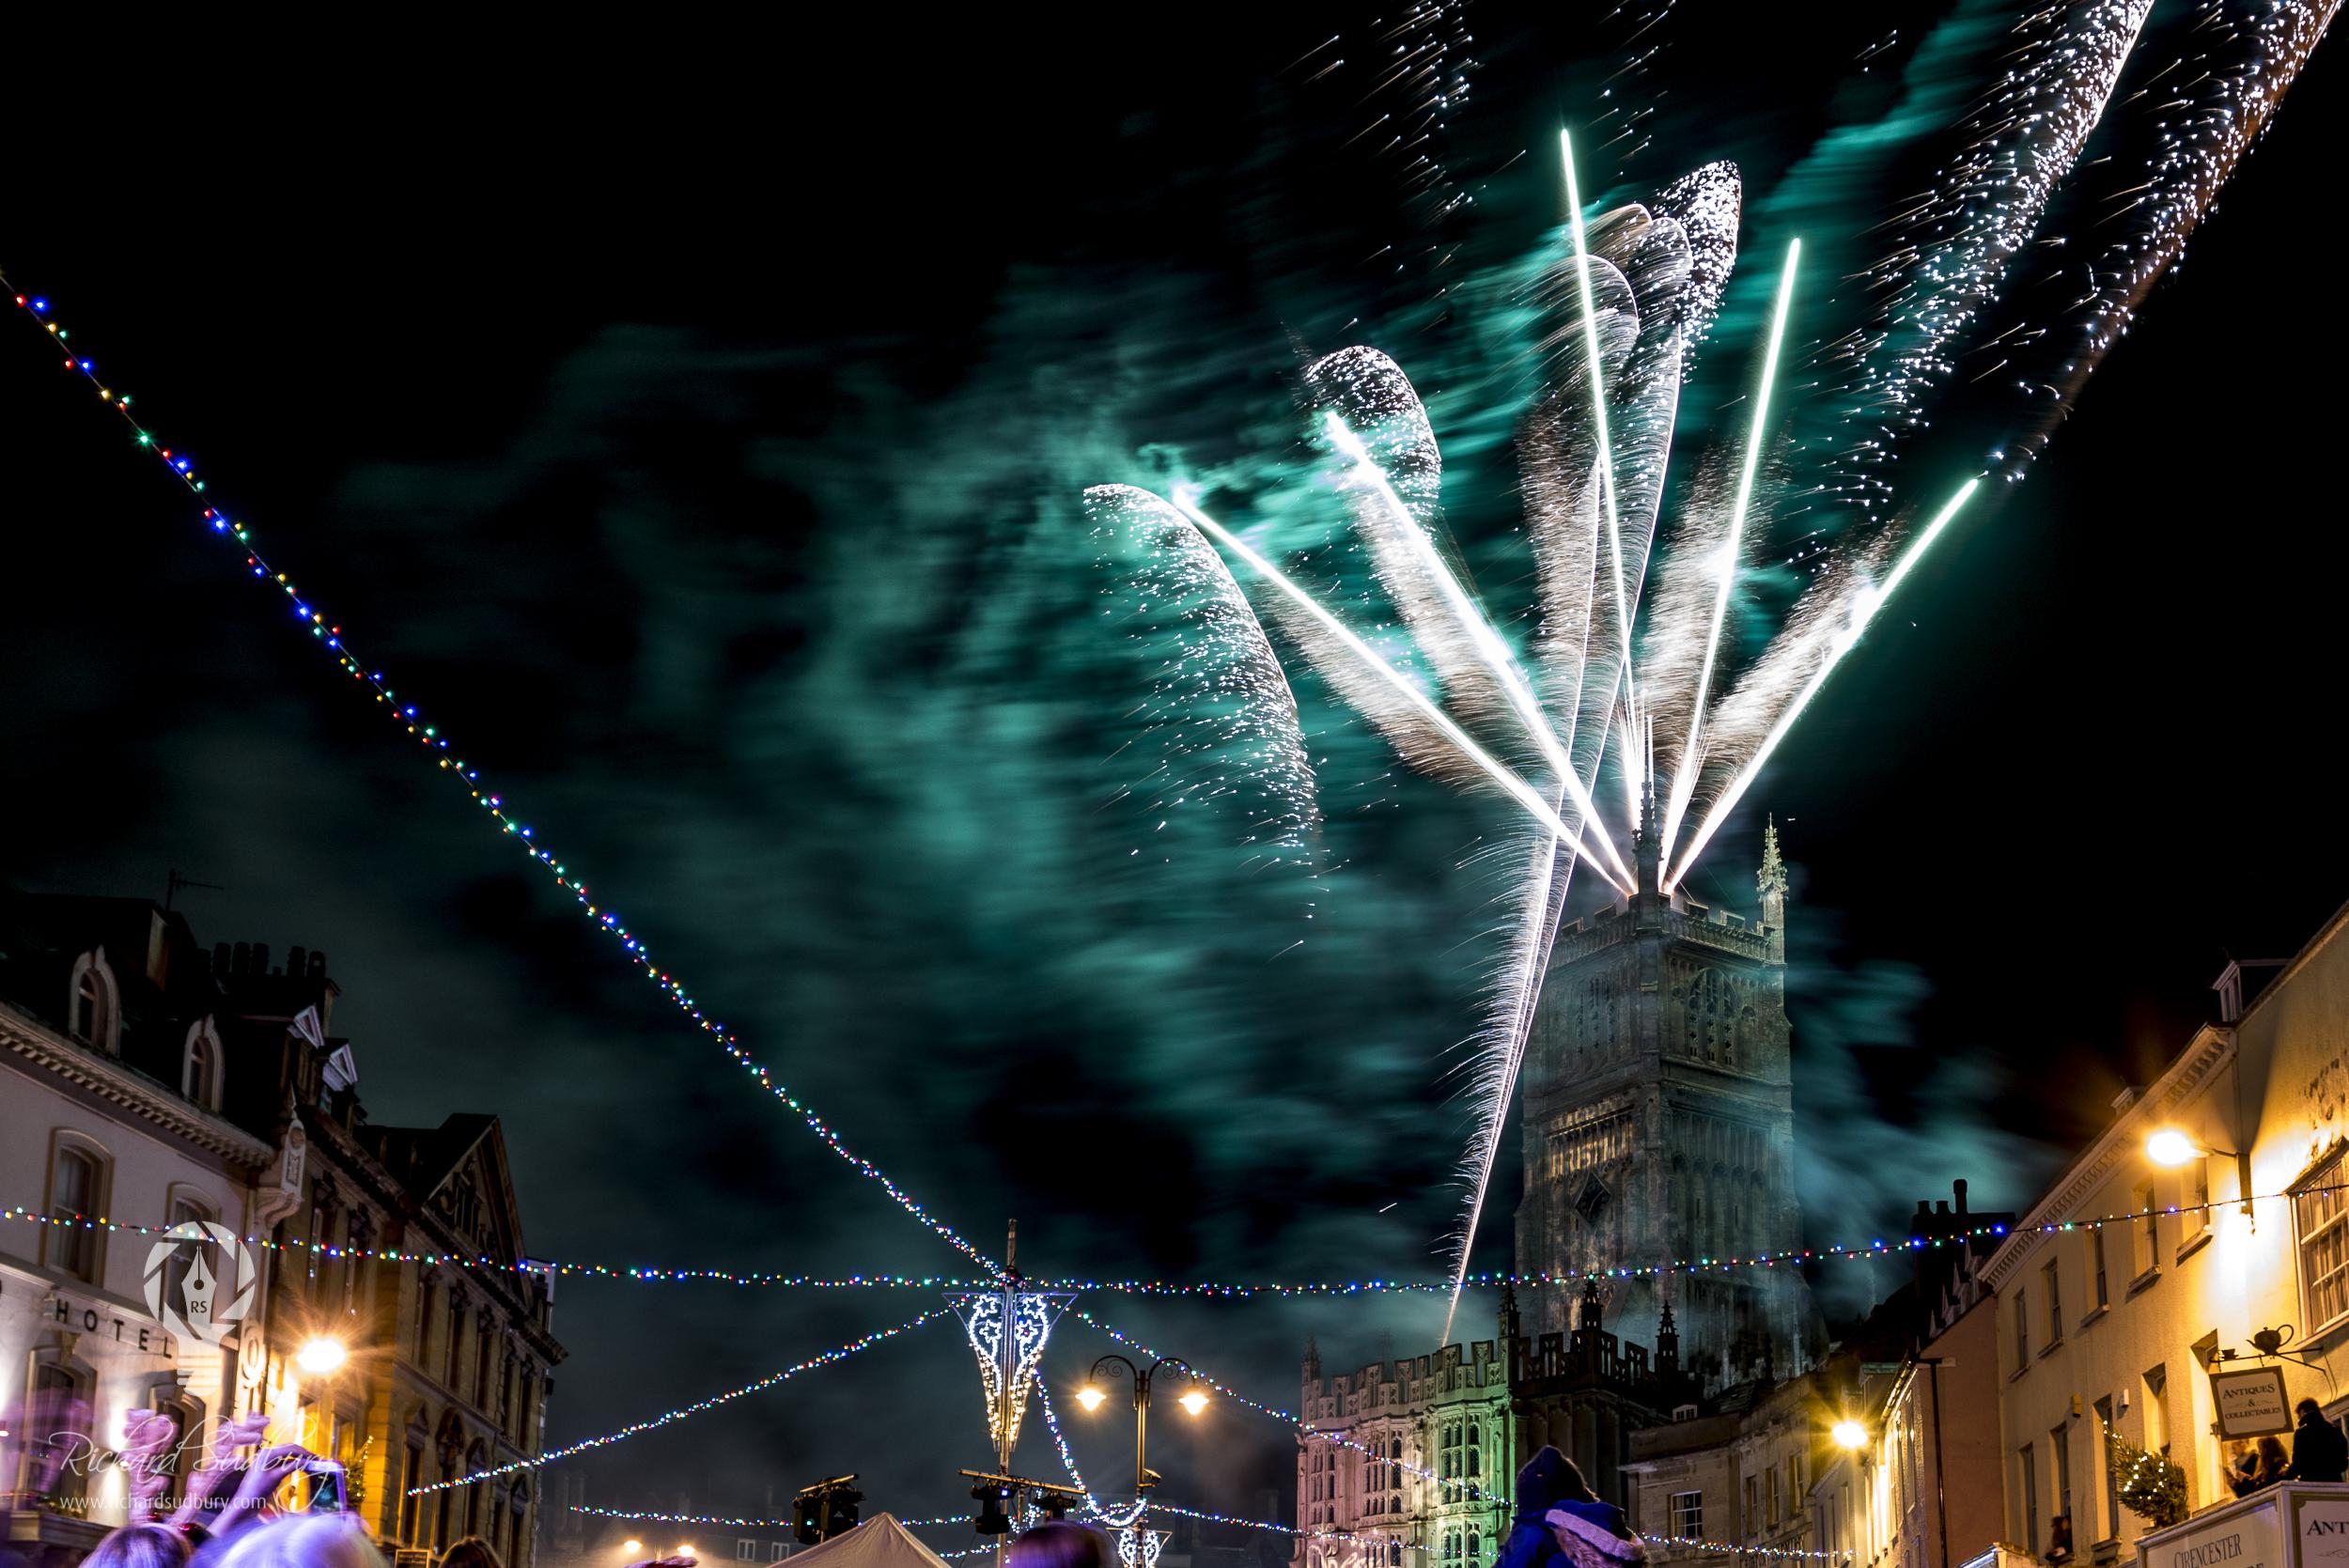 Fireworks over Cirencester